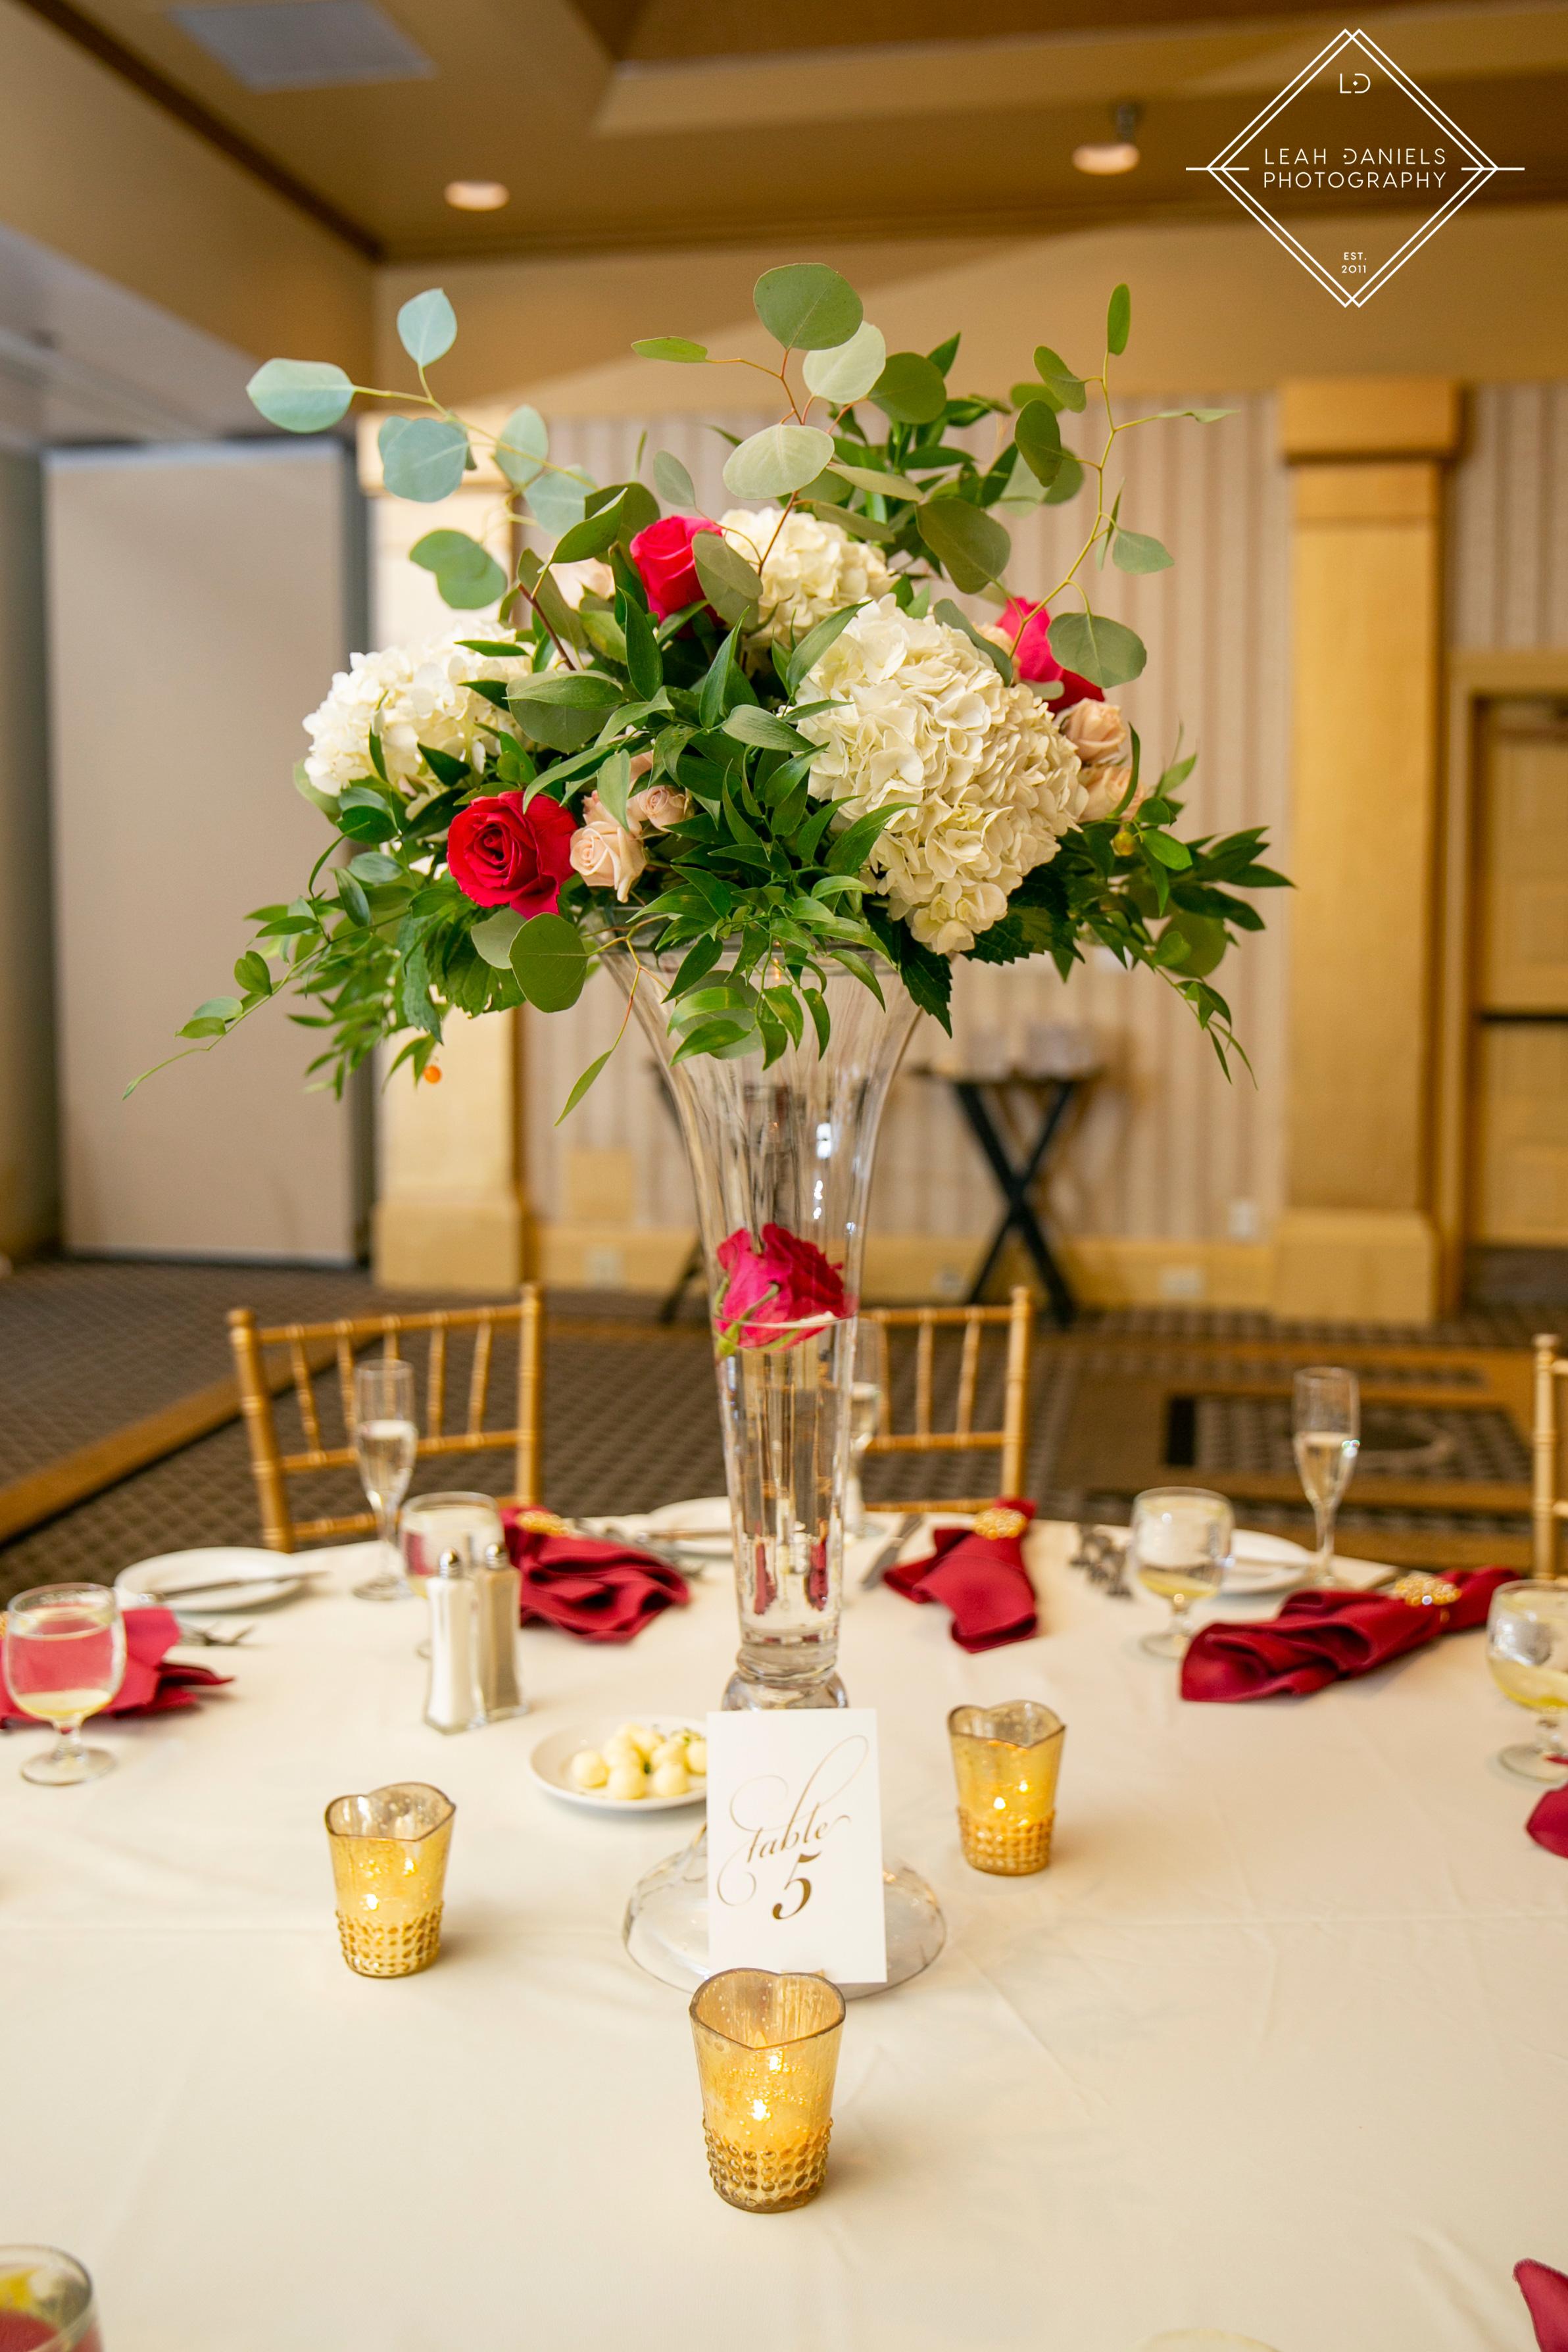 Radisson Scranton Wedding - Centerpiece Ideas